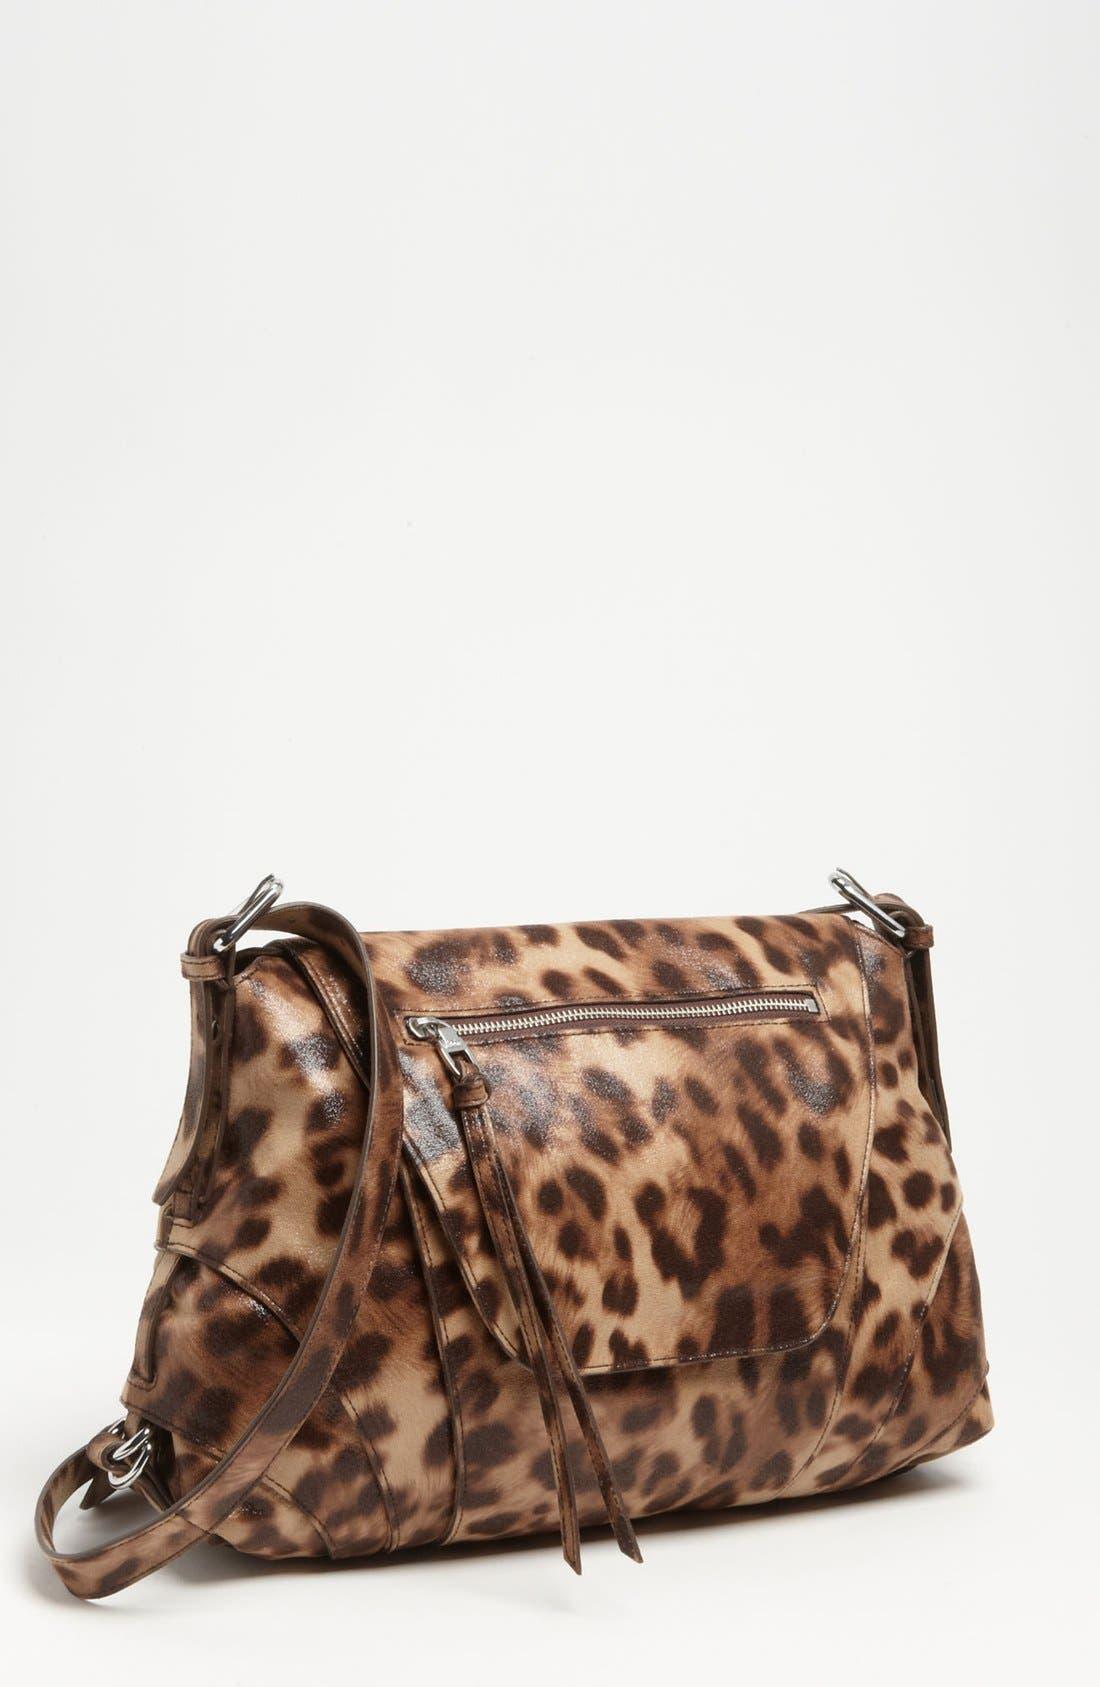 Alternate Image 1 Selected - Kooba 'Brielle' Leather Crossbody Bag